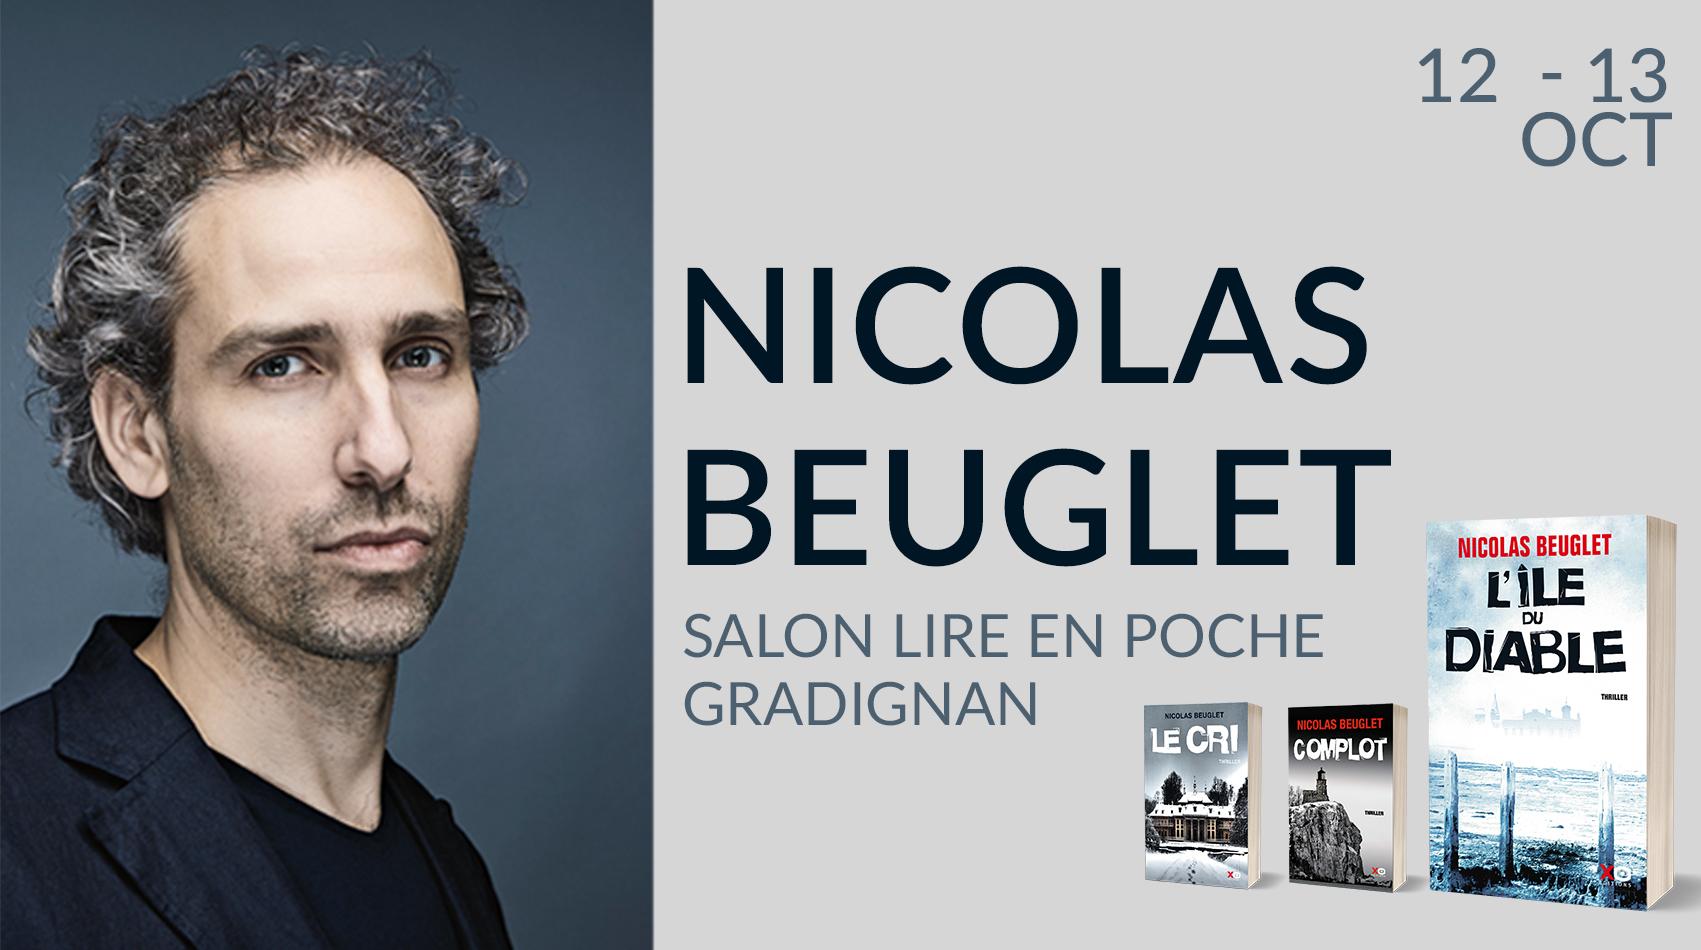 NICOLAS BEUGLET AU SALON LIRE EN POCHE DE GRADIGNAN